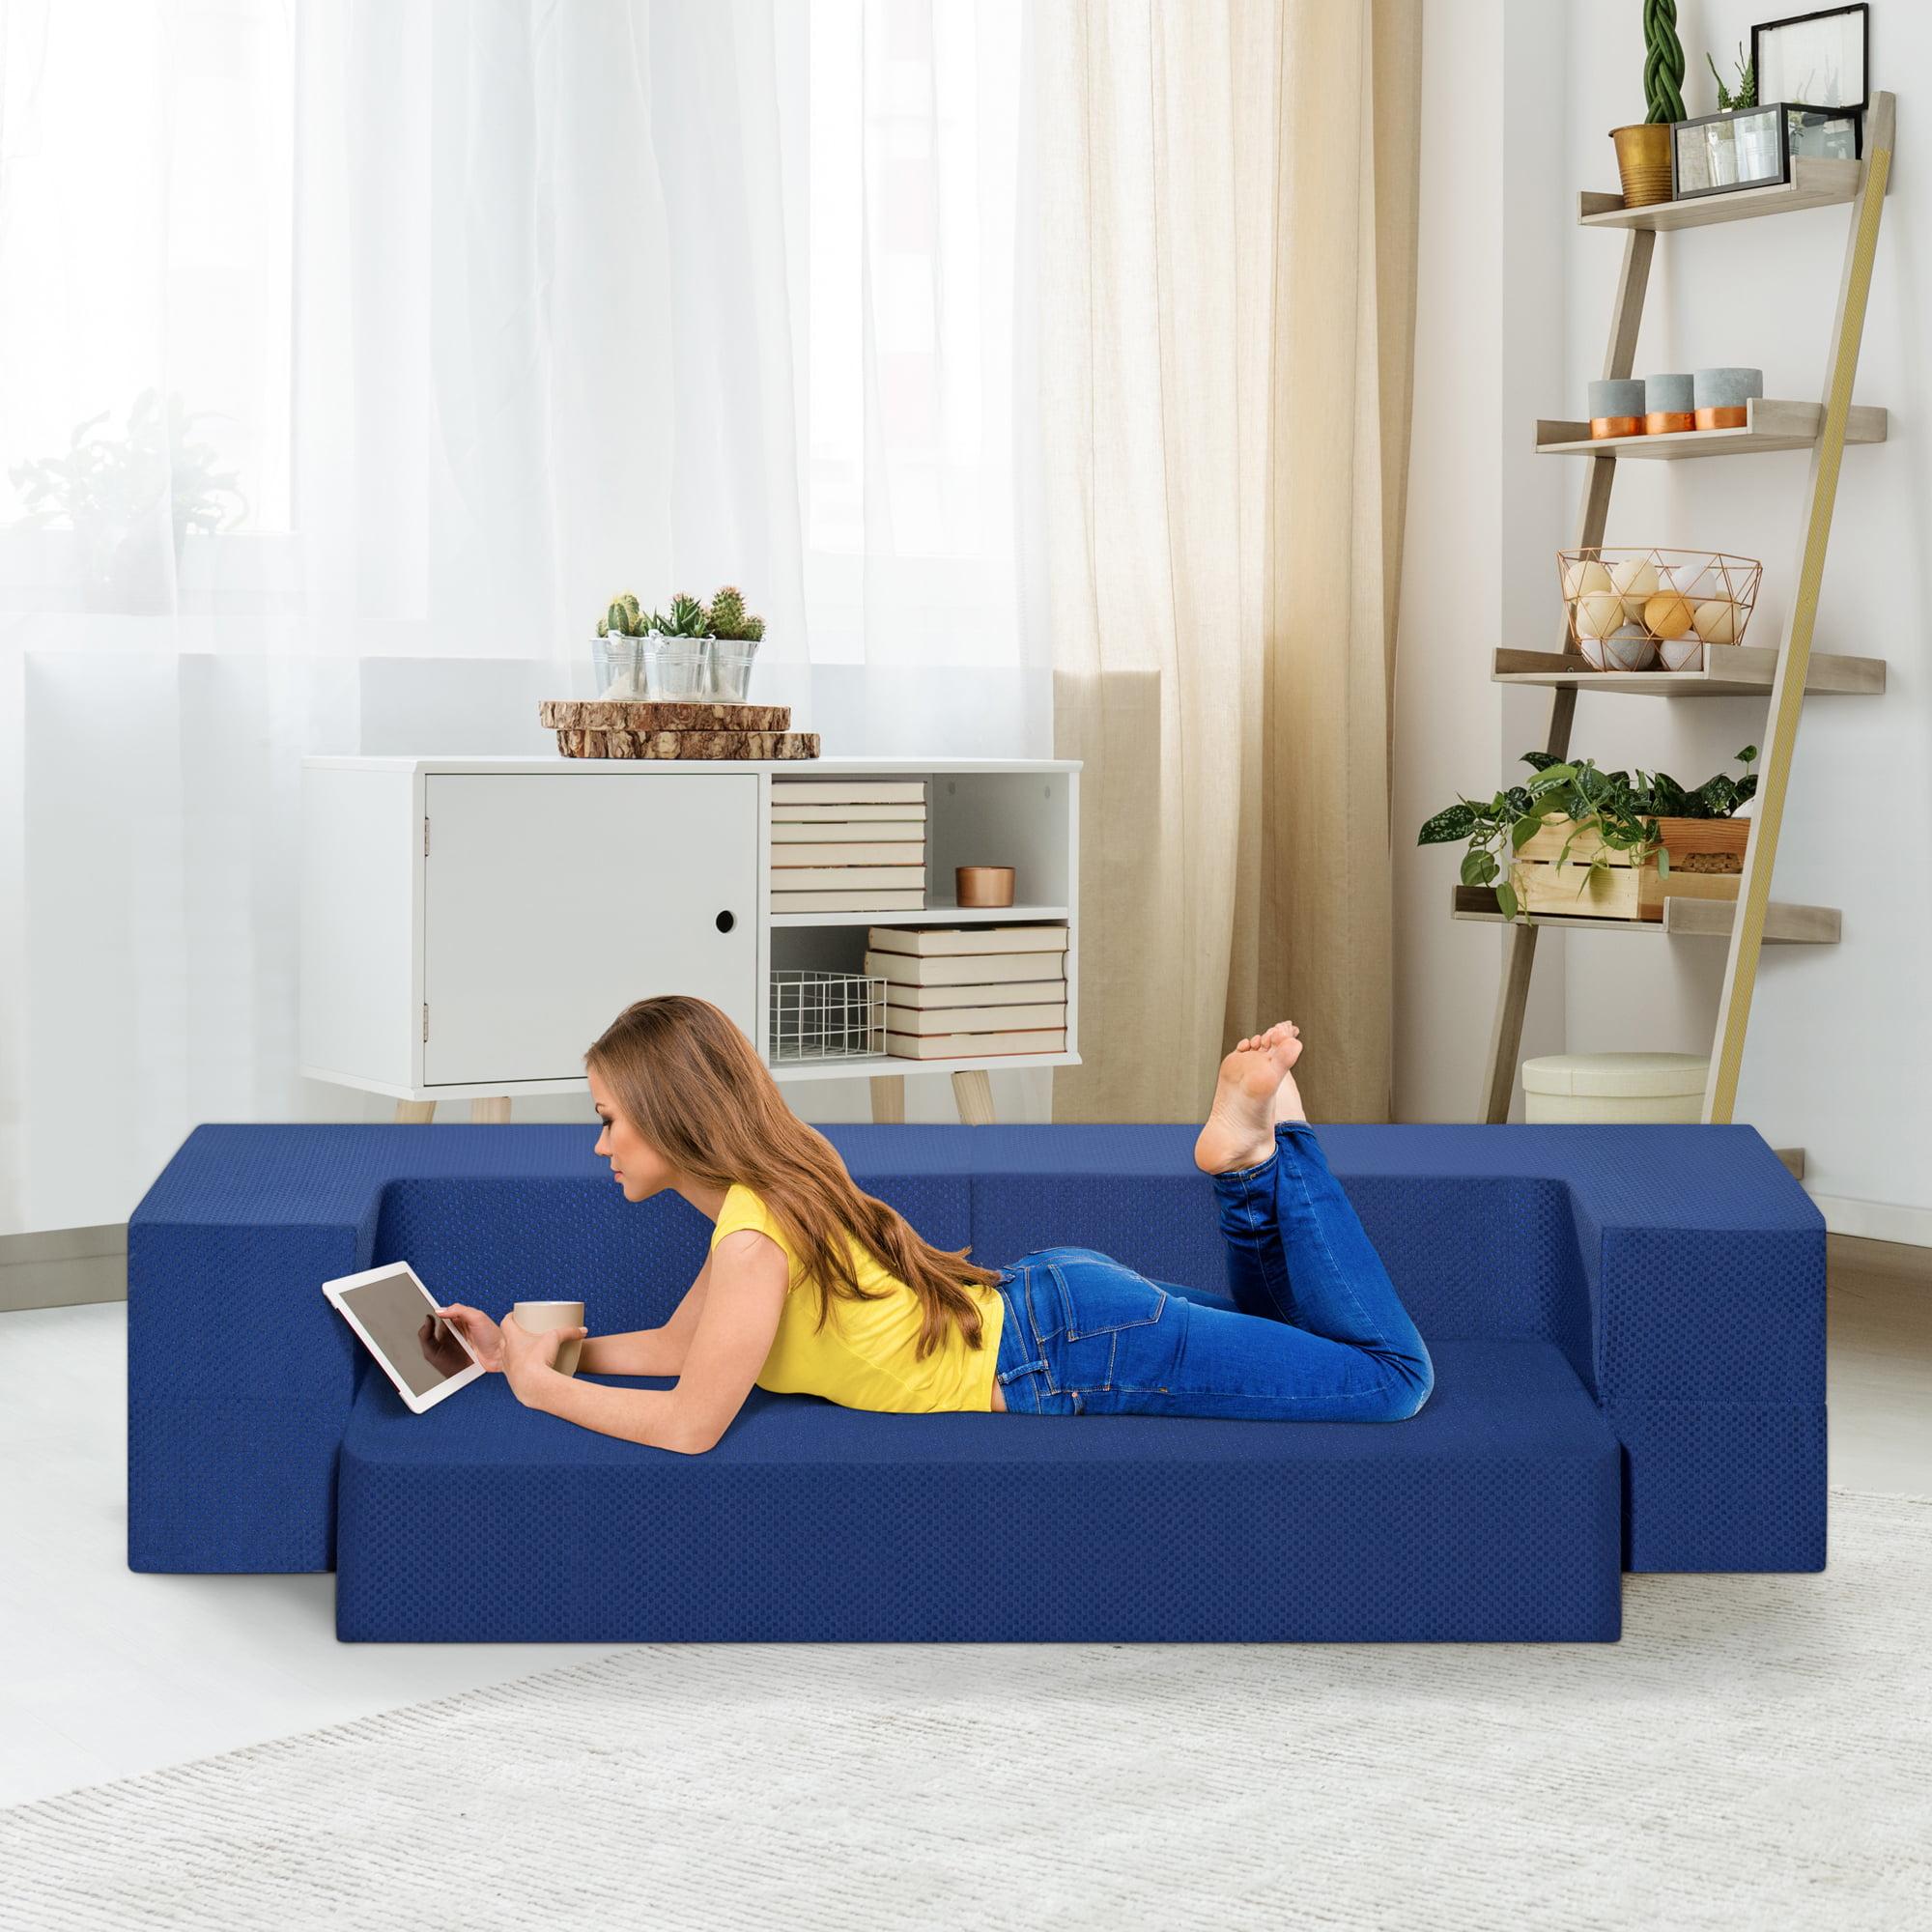 Fantastic Granrest 8 3 In 1 Gel Memory Foam Mattress Sofa Bed Dark Blue Walmart Com Short Links Chair Design For Home Short Linksinfo